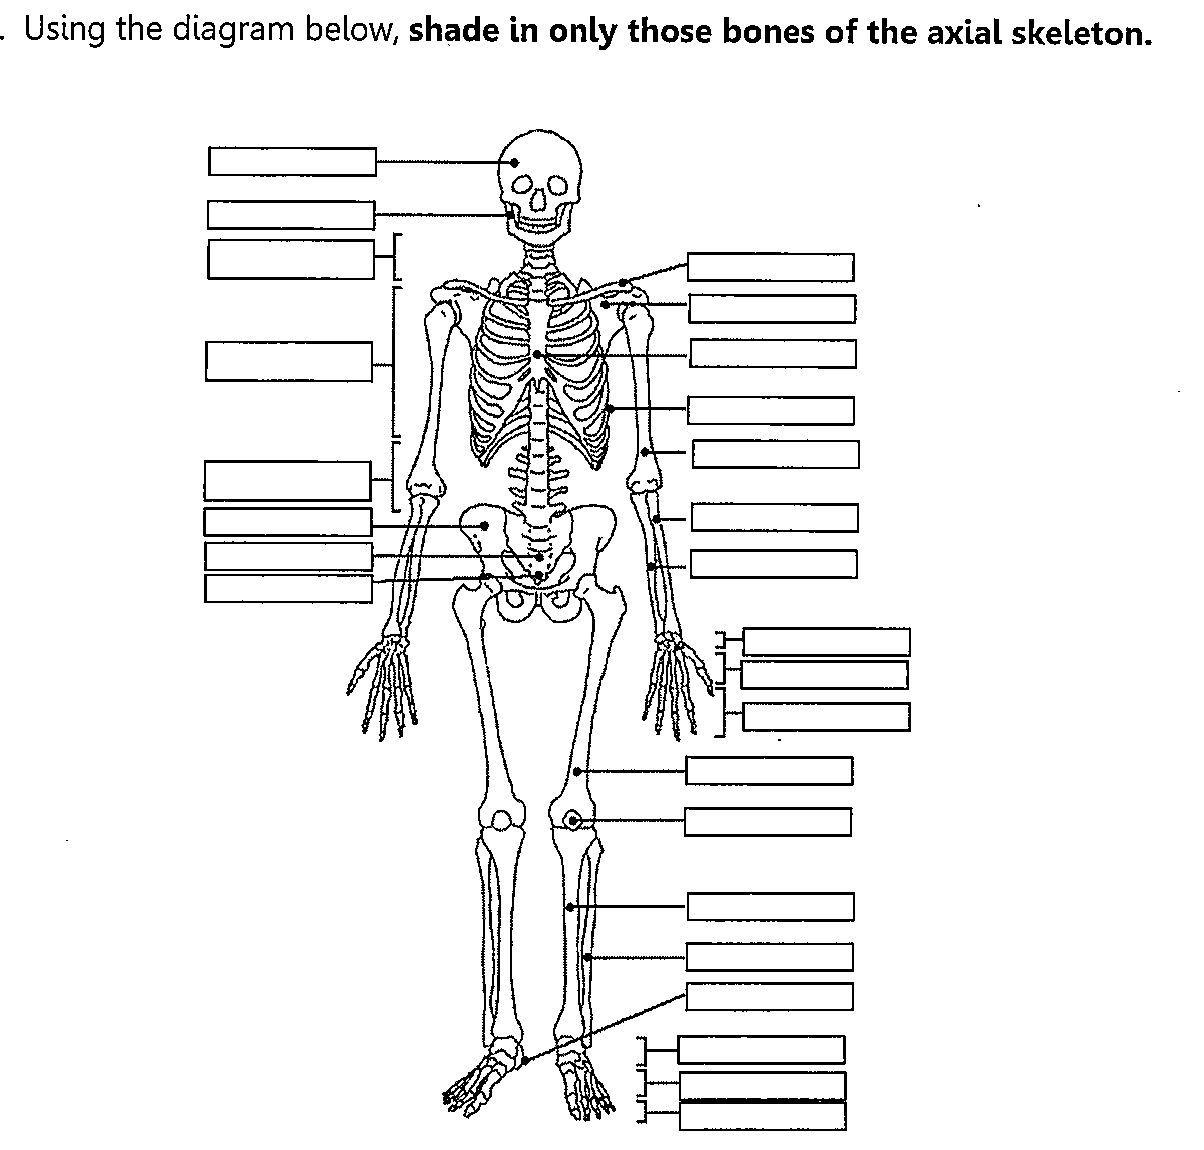 The Skeletal System Diagram Labeled